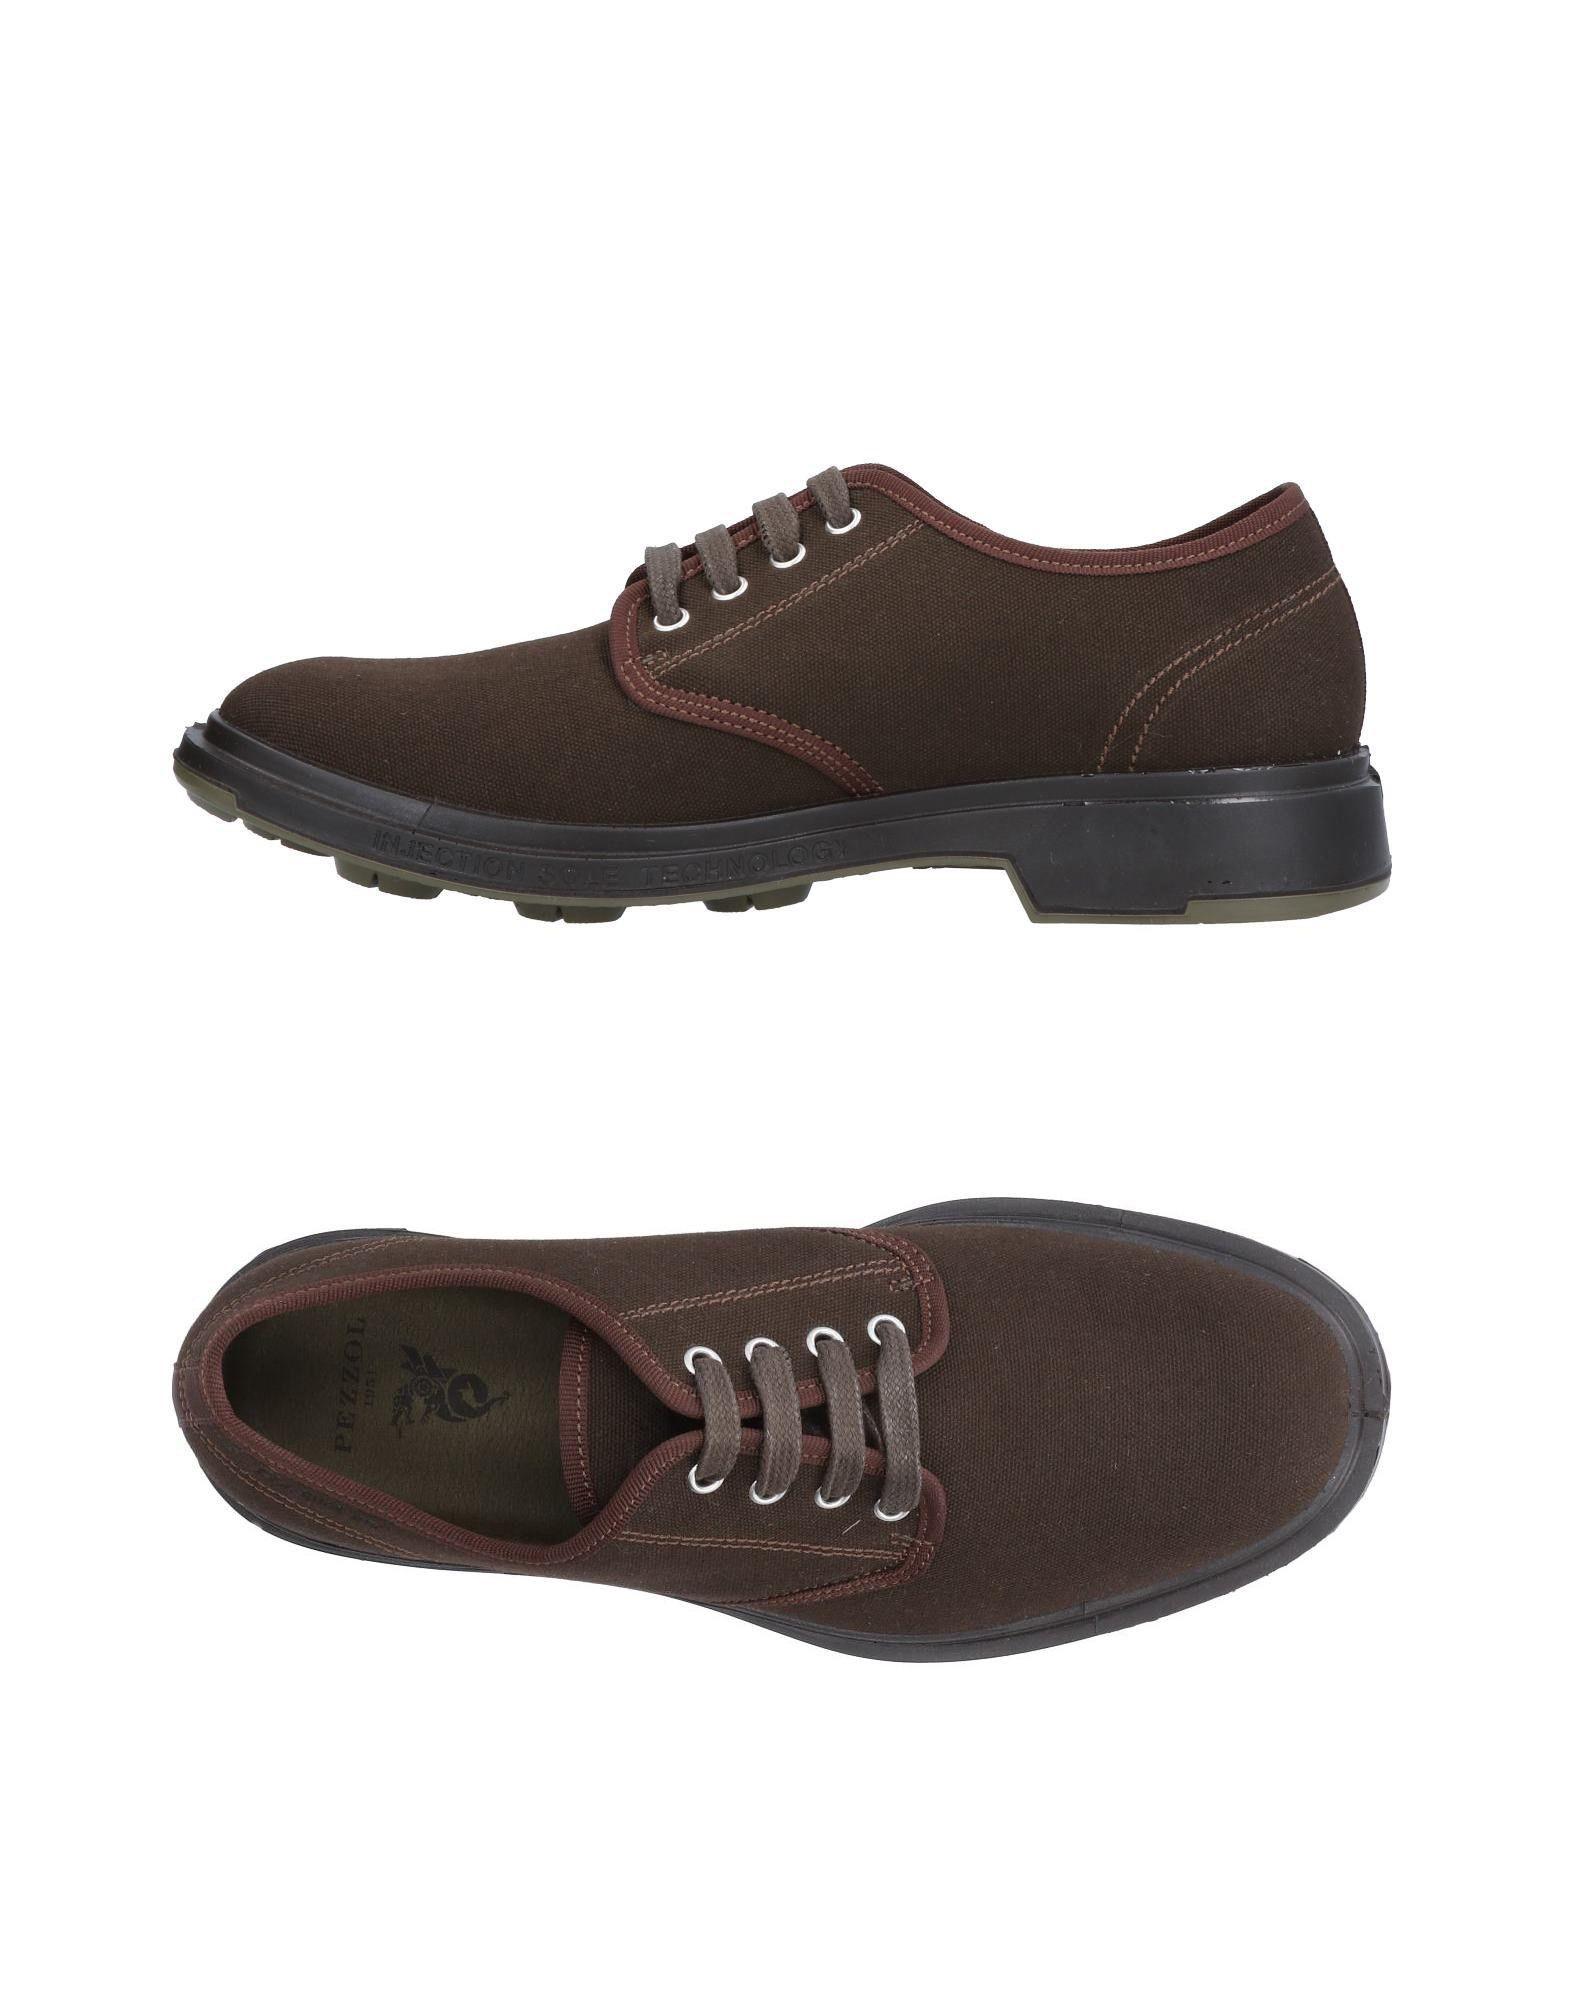 Фото - PEZZOL 1951 Обувь на шнурках обувь на высокой платформе dkny